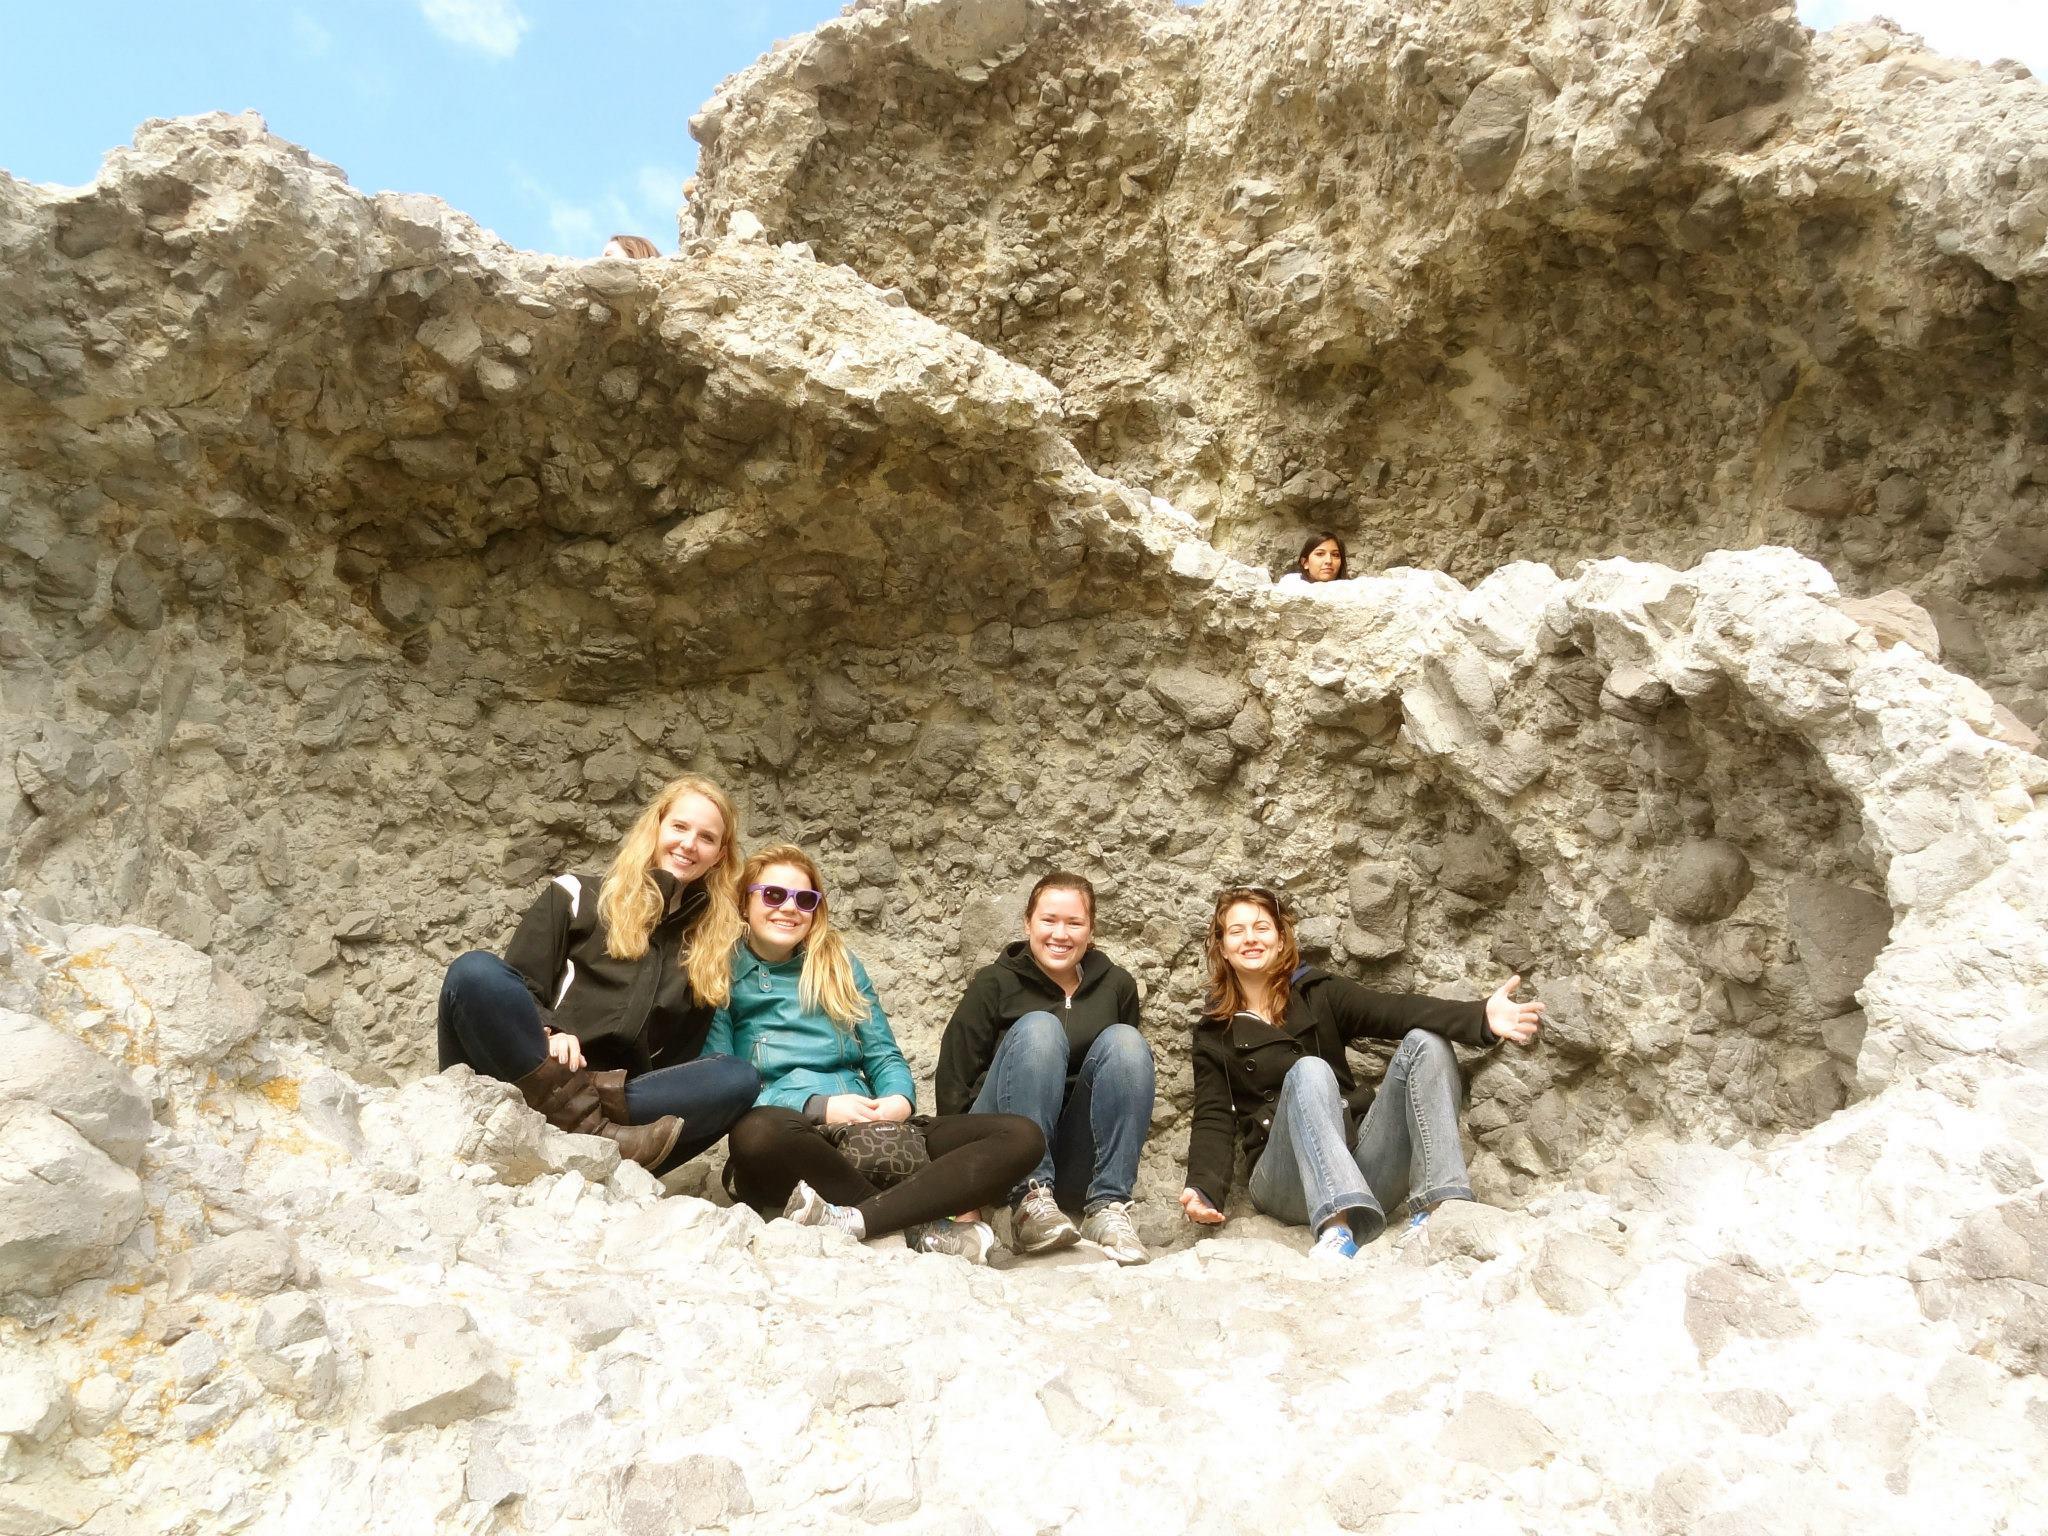 Climbing in Volcano Rocks